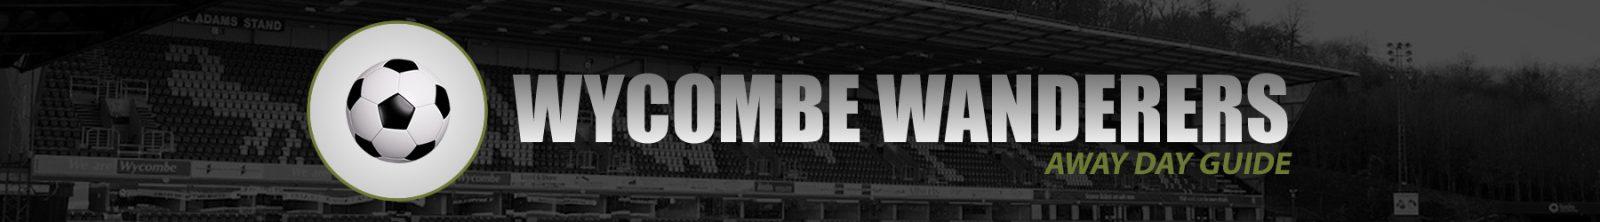 Wycombe Wanderers Away